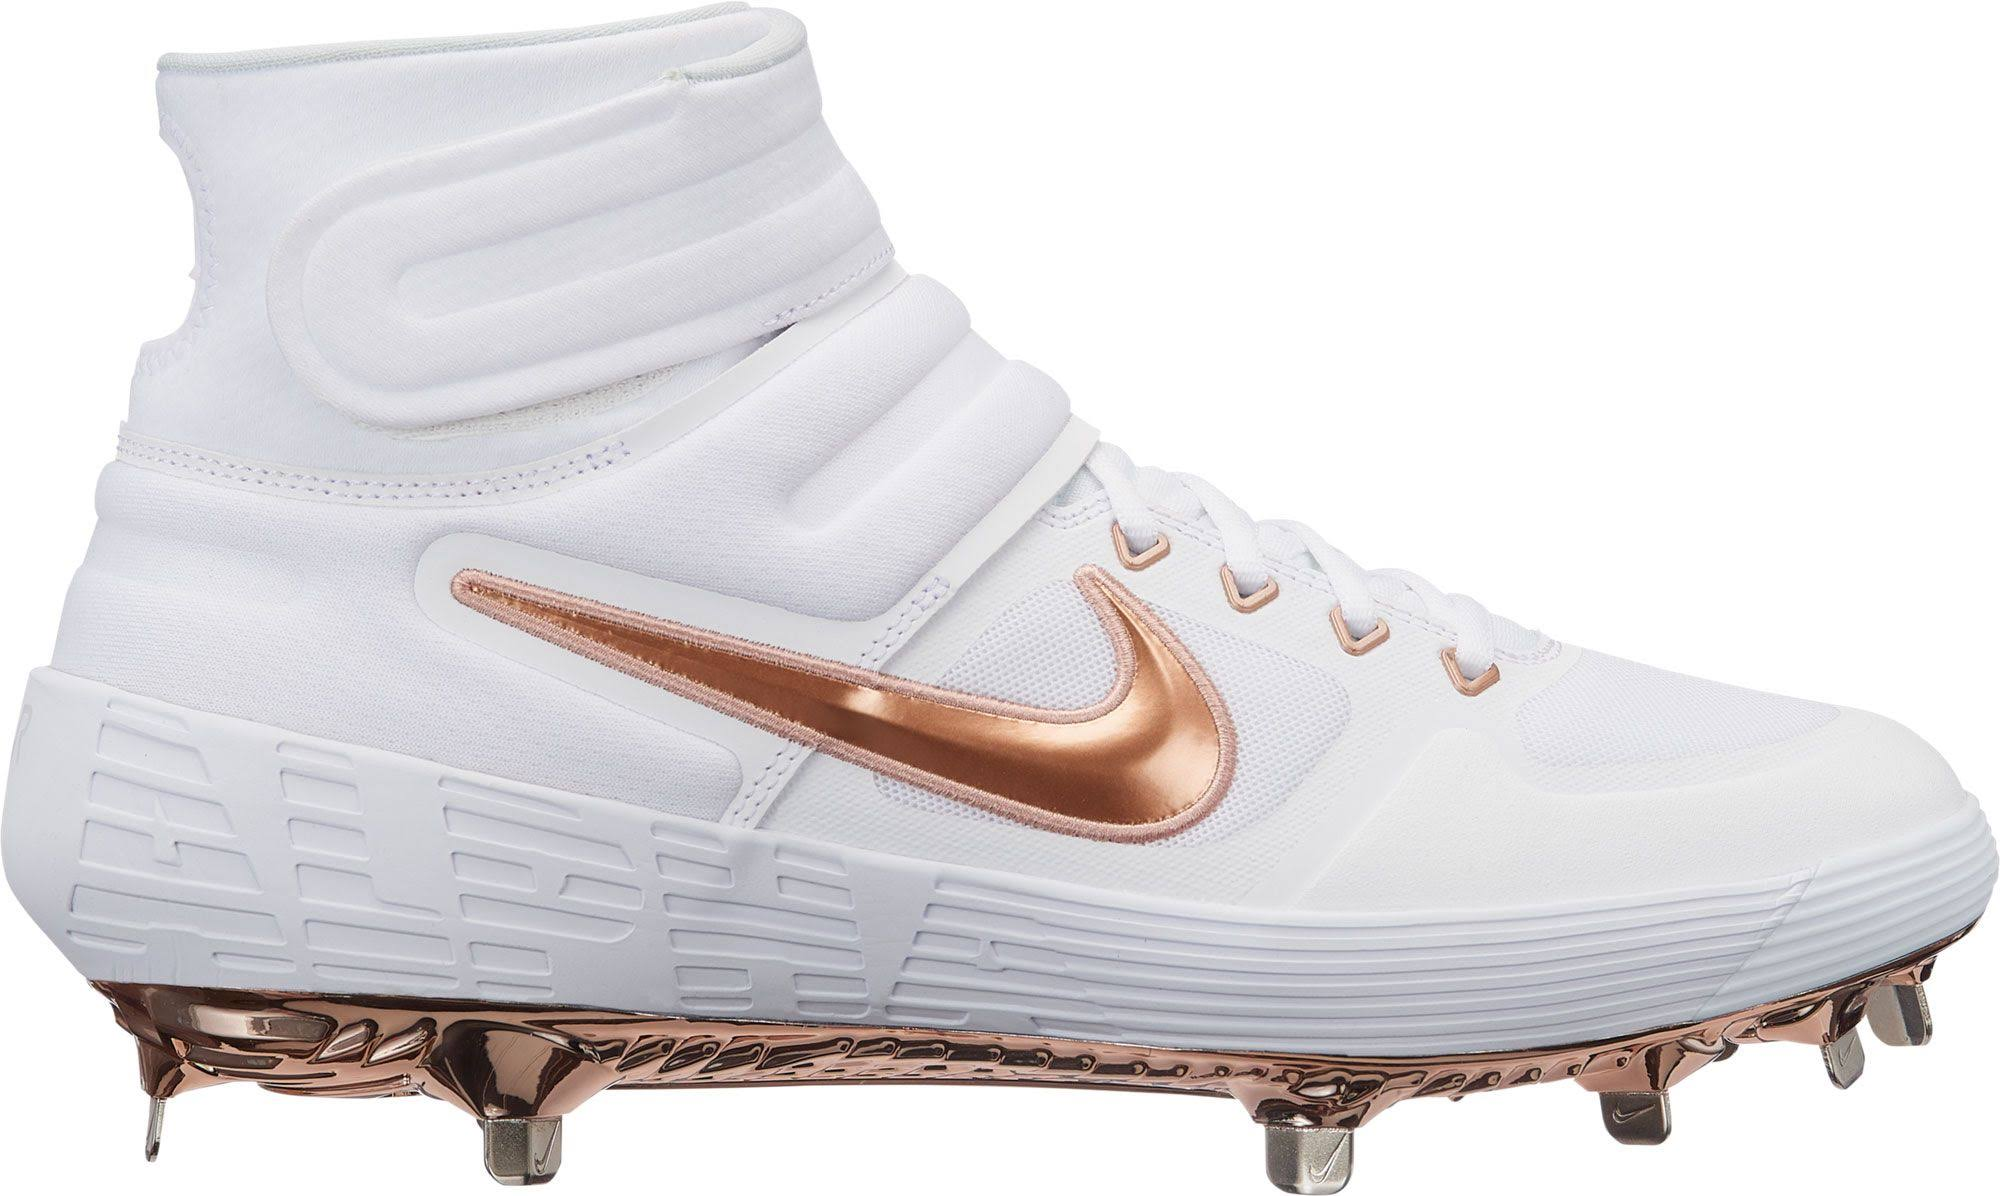 Nike Rojo Puro De Metálico Botines Bronce Para Béisbol Platino 2 Alpha Huarache Elite Hombre Blanco pZCExwqU